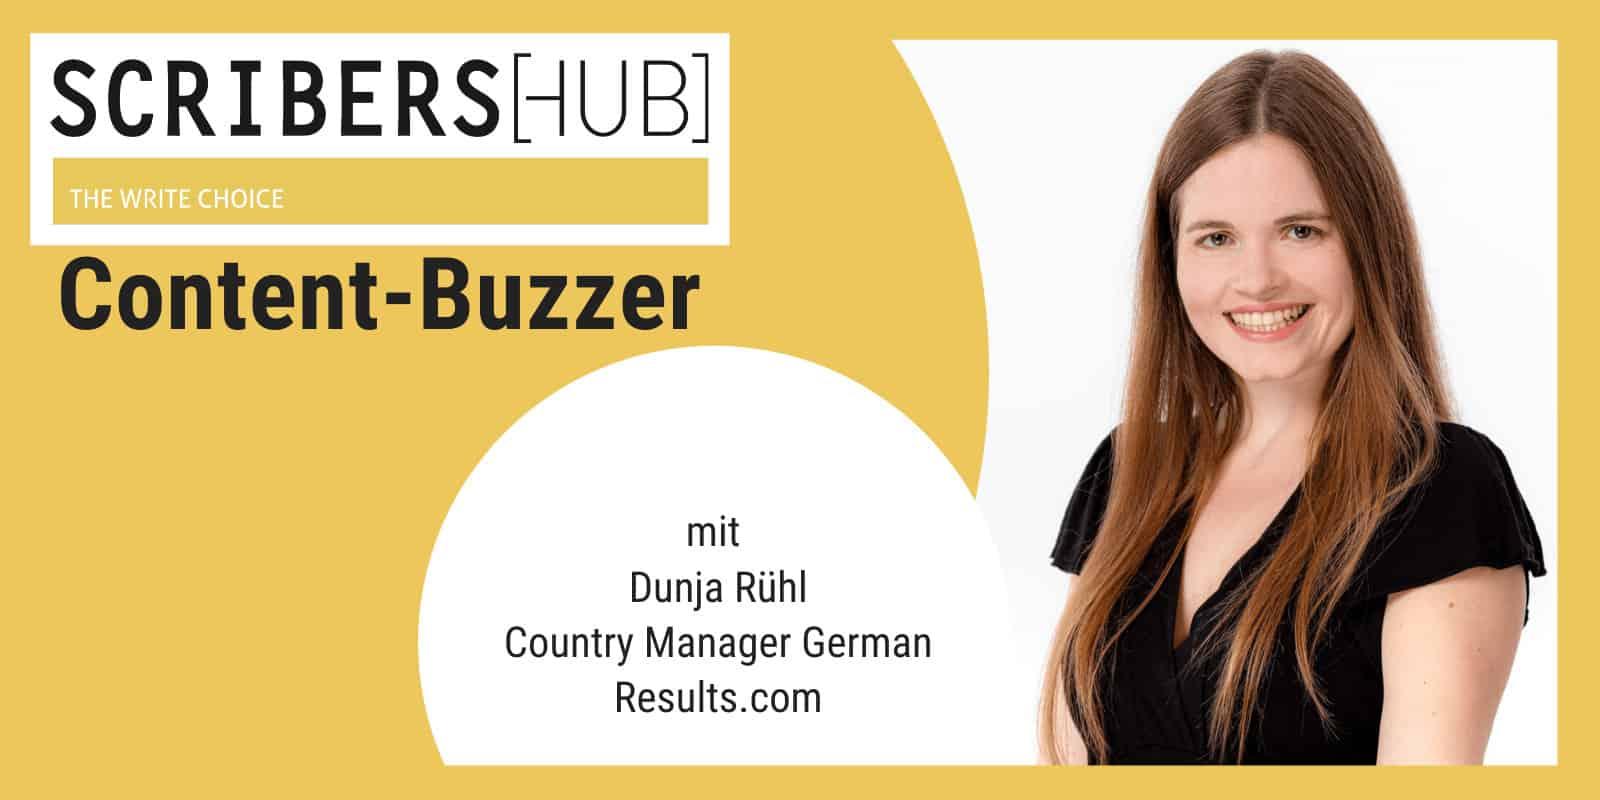 Dunja Rühl im Scribershub Content Buzzer